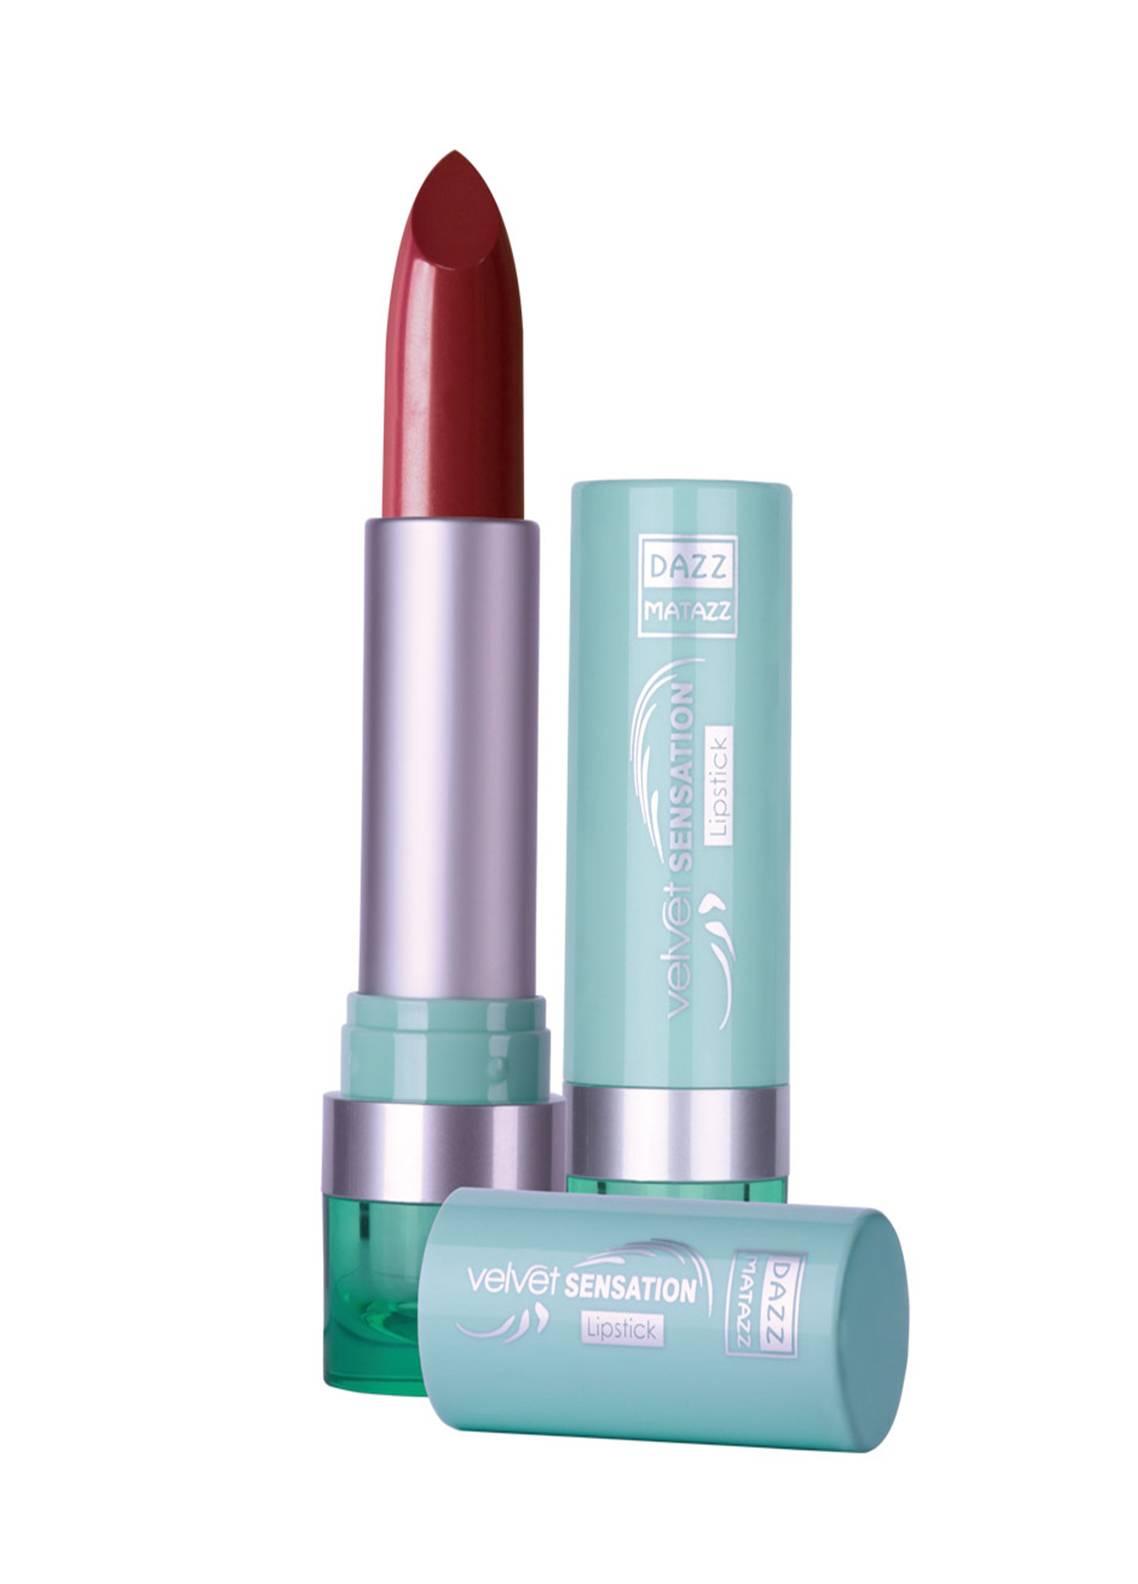 Dazz Matazz Velvet Sensation Lipstick-06 ENGLISH TOFFEE